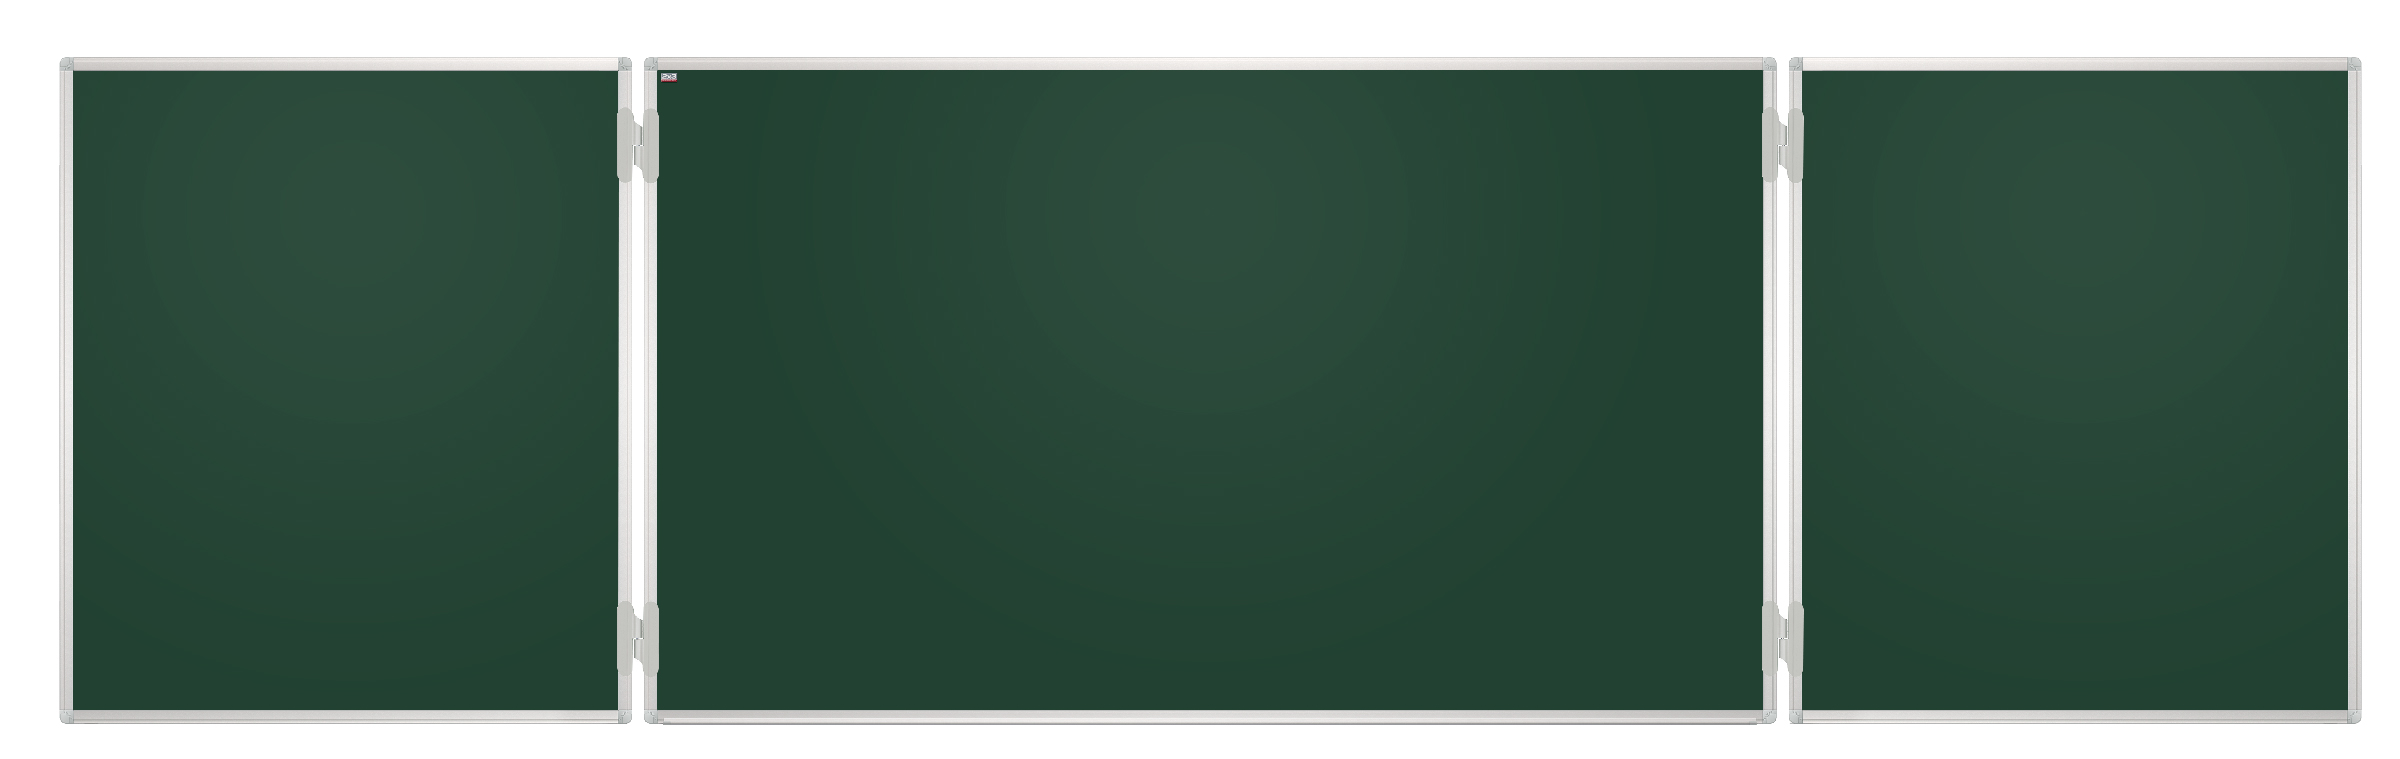 tablice szkolne rozk adane tryptyki 2 3 s a. Black Bedroom Furniture Sets. Home Design Ideas